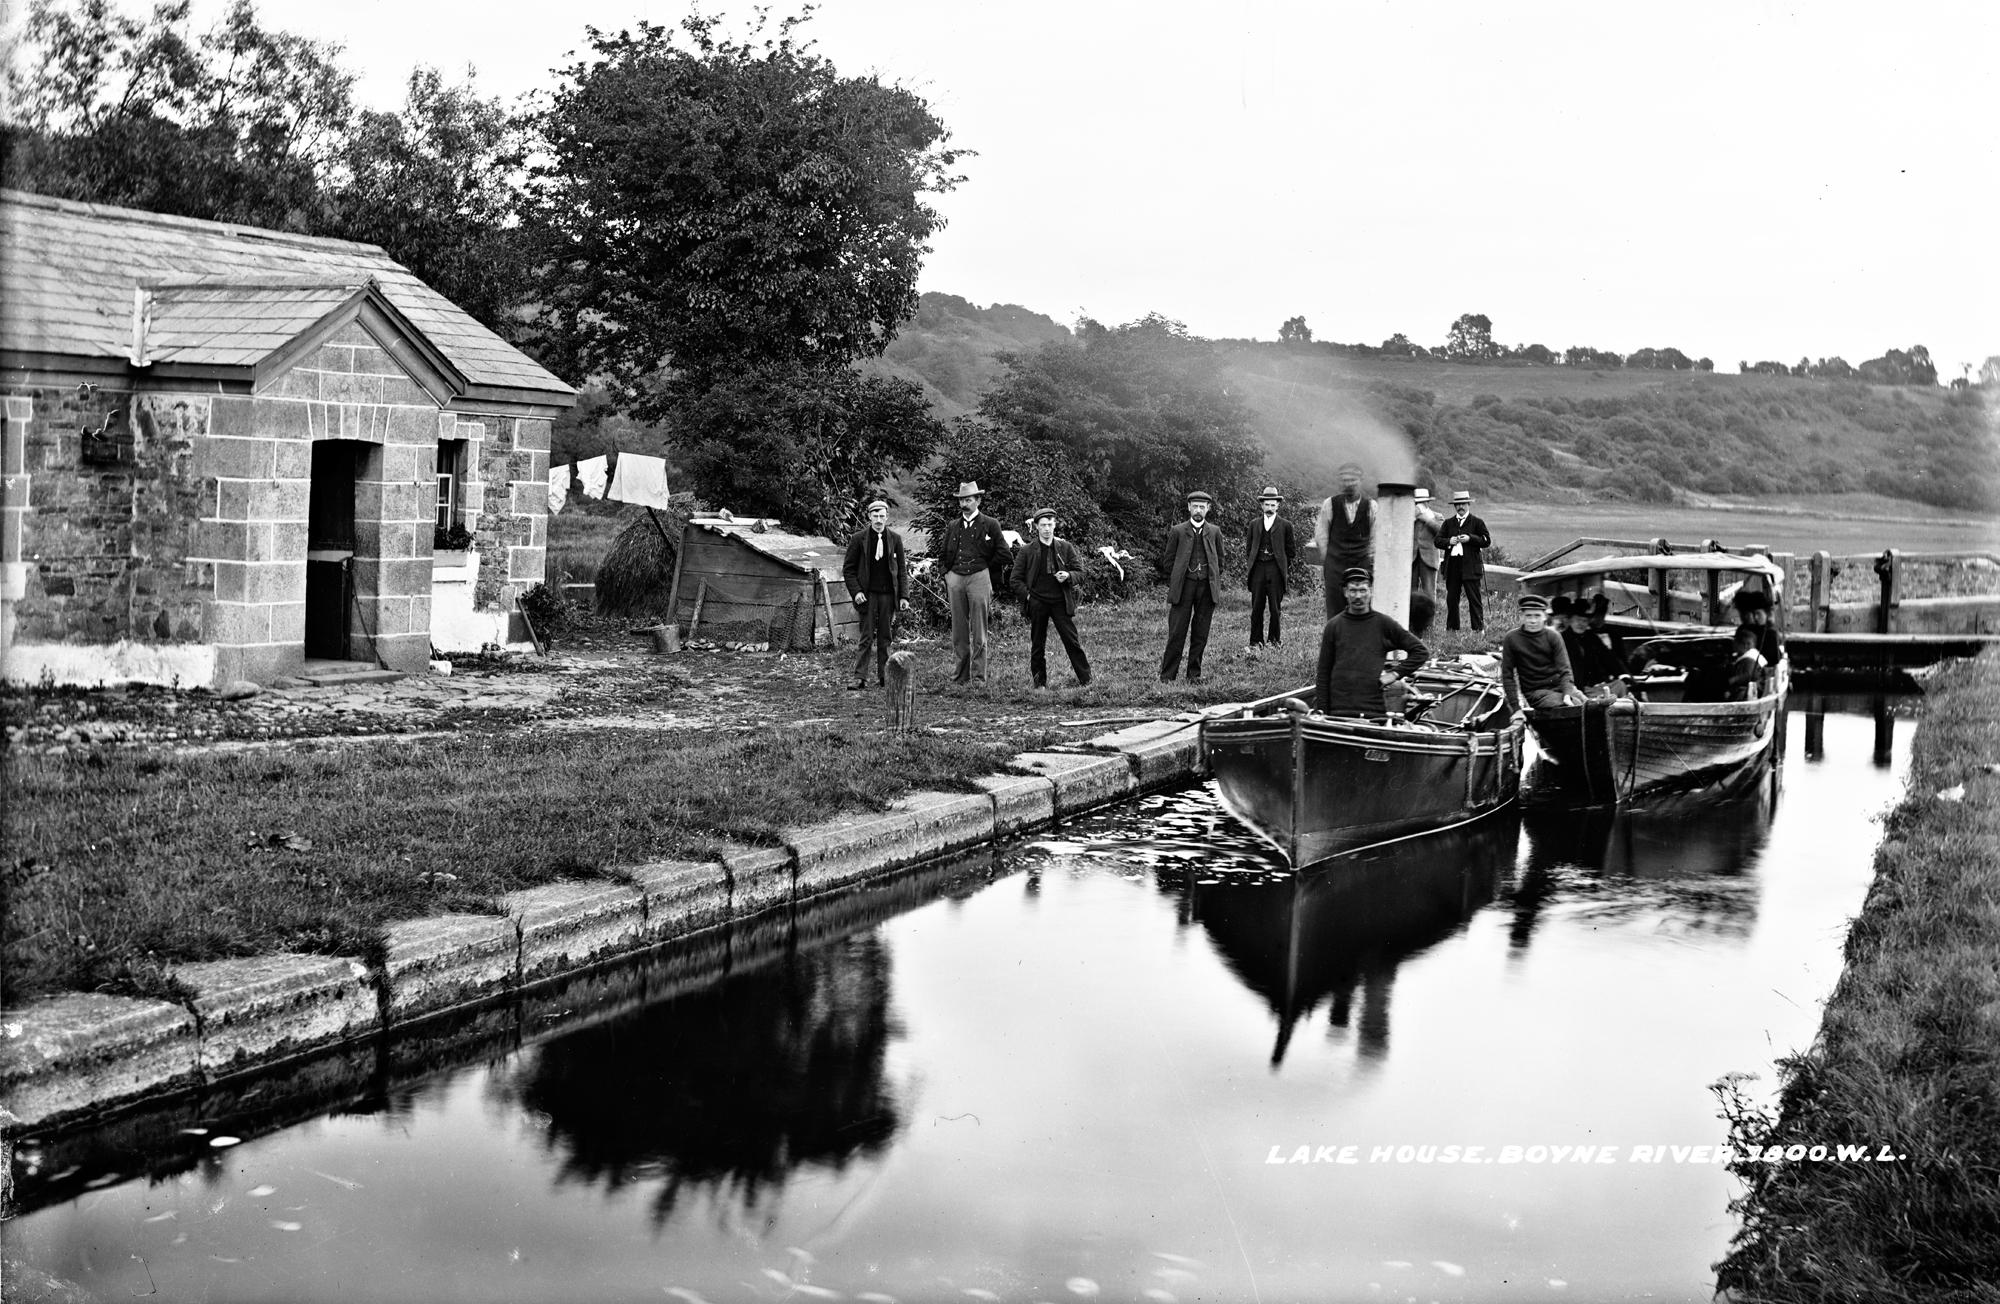 Boyne Valley: Lake House, Boyne Valley, Co. Louth